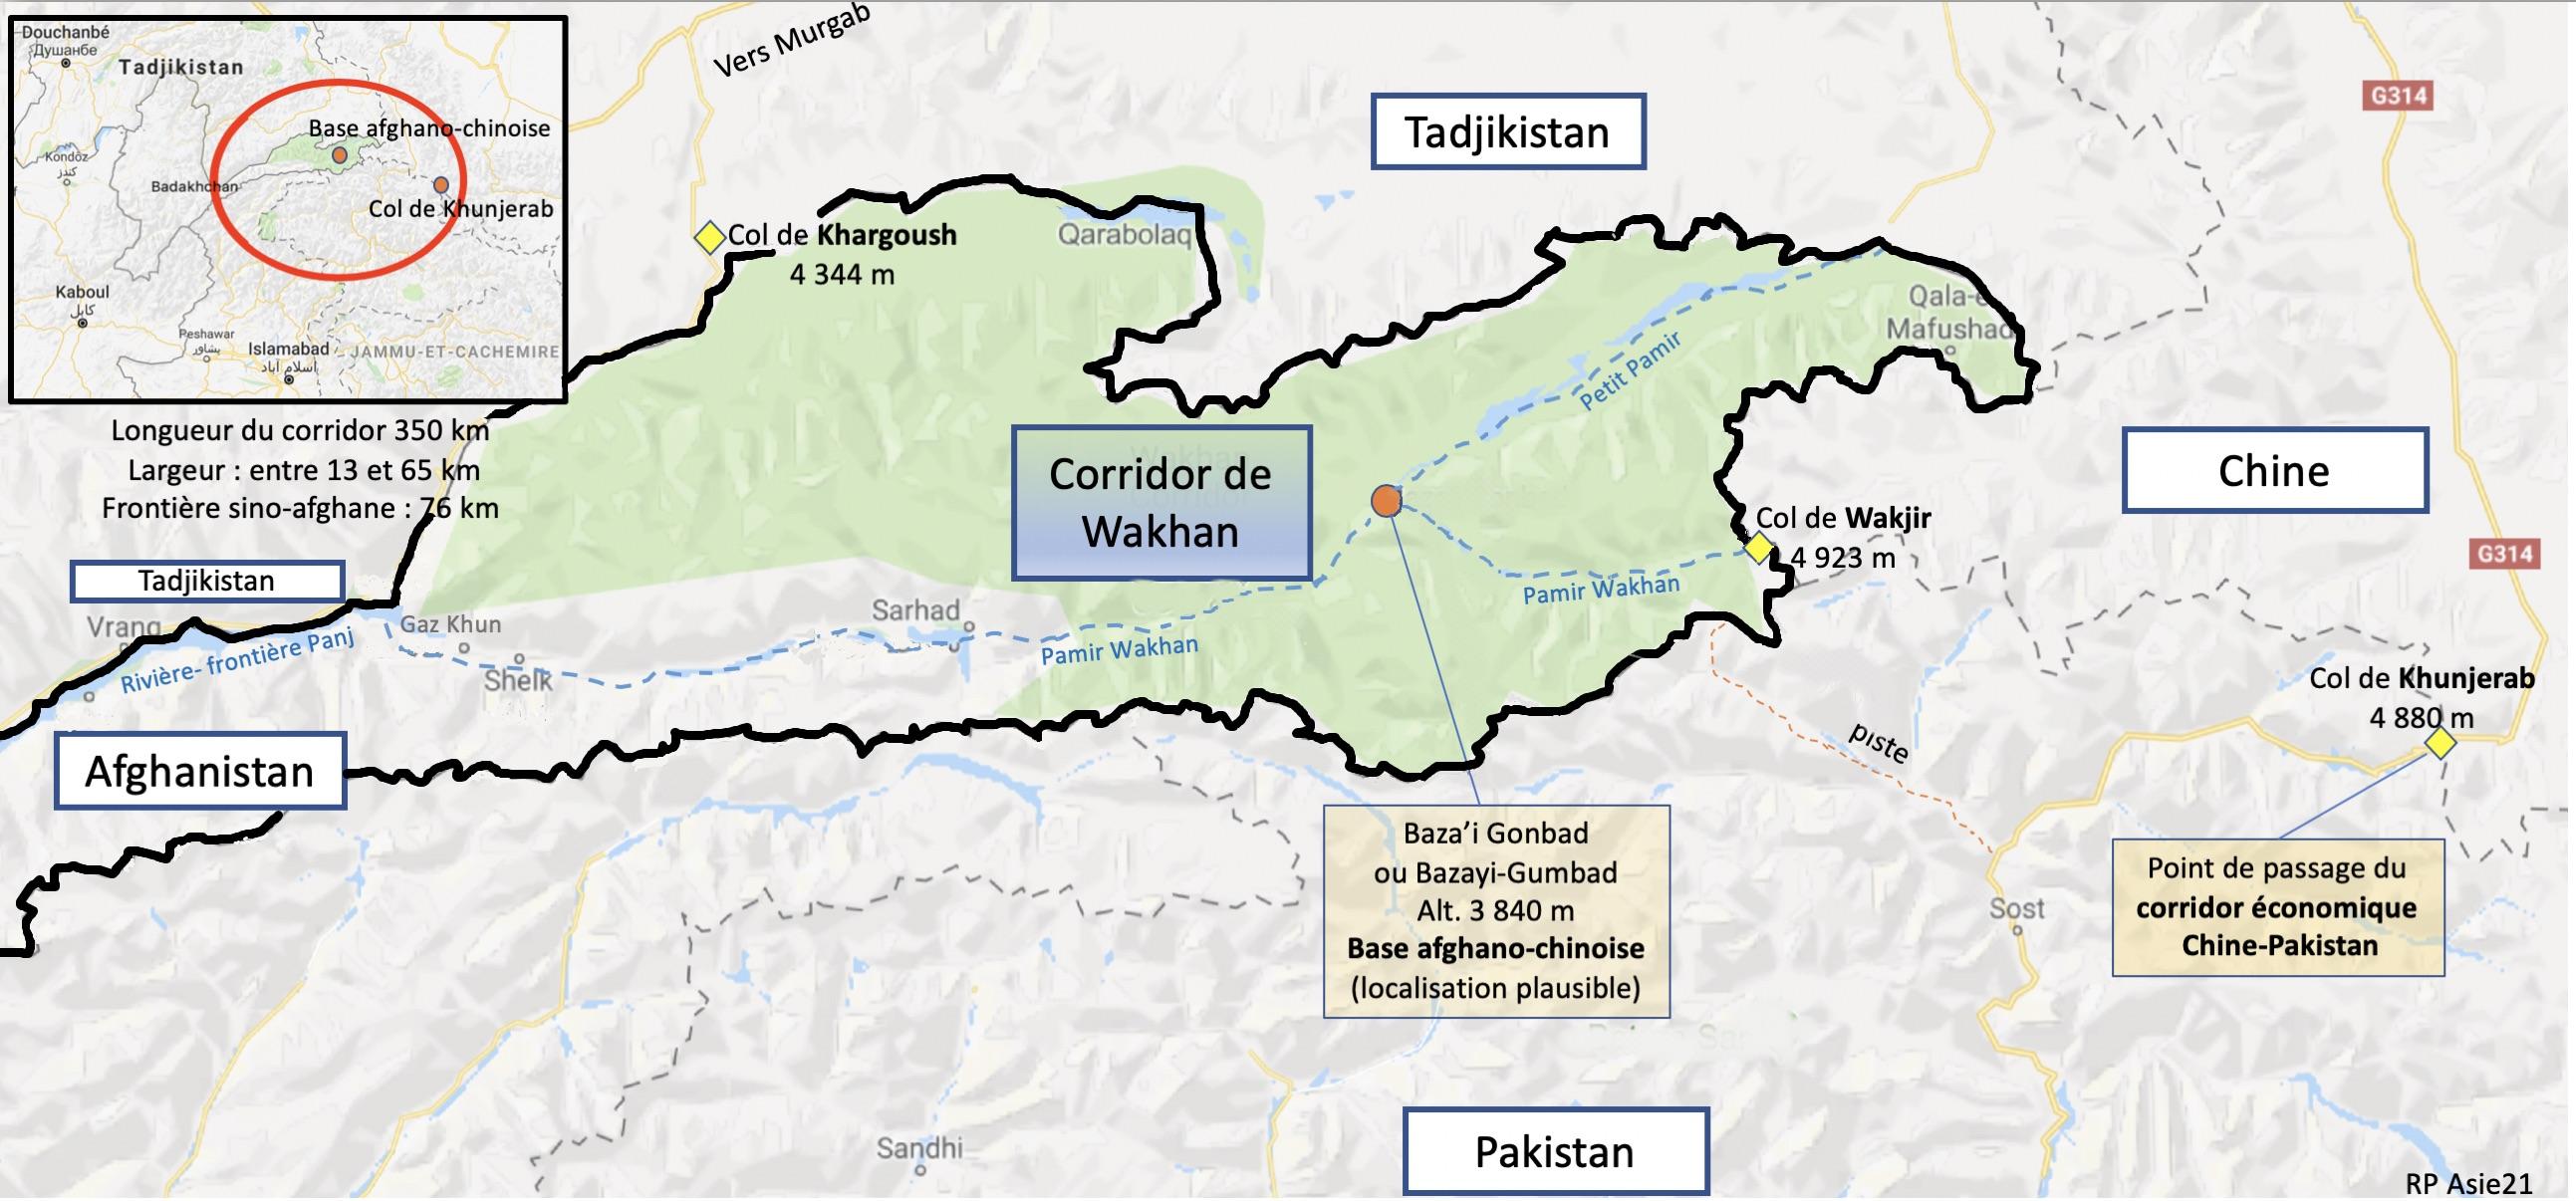 Le corridor de Wakhan - Afghanistan